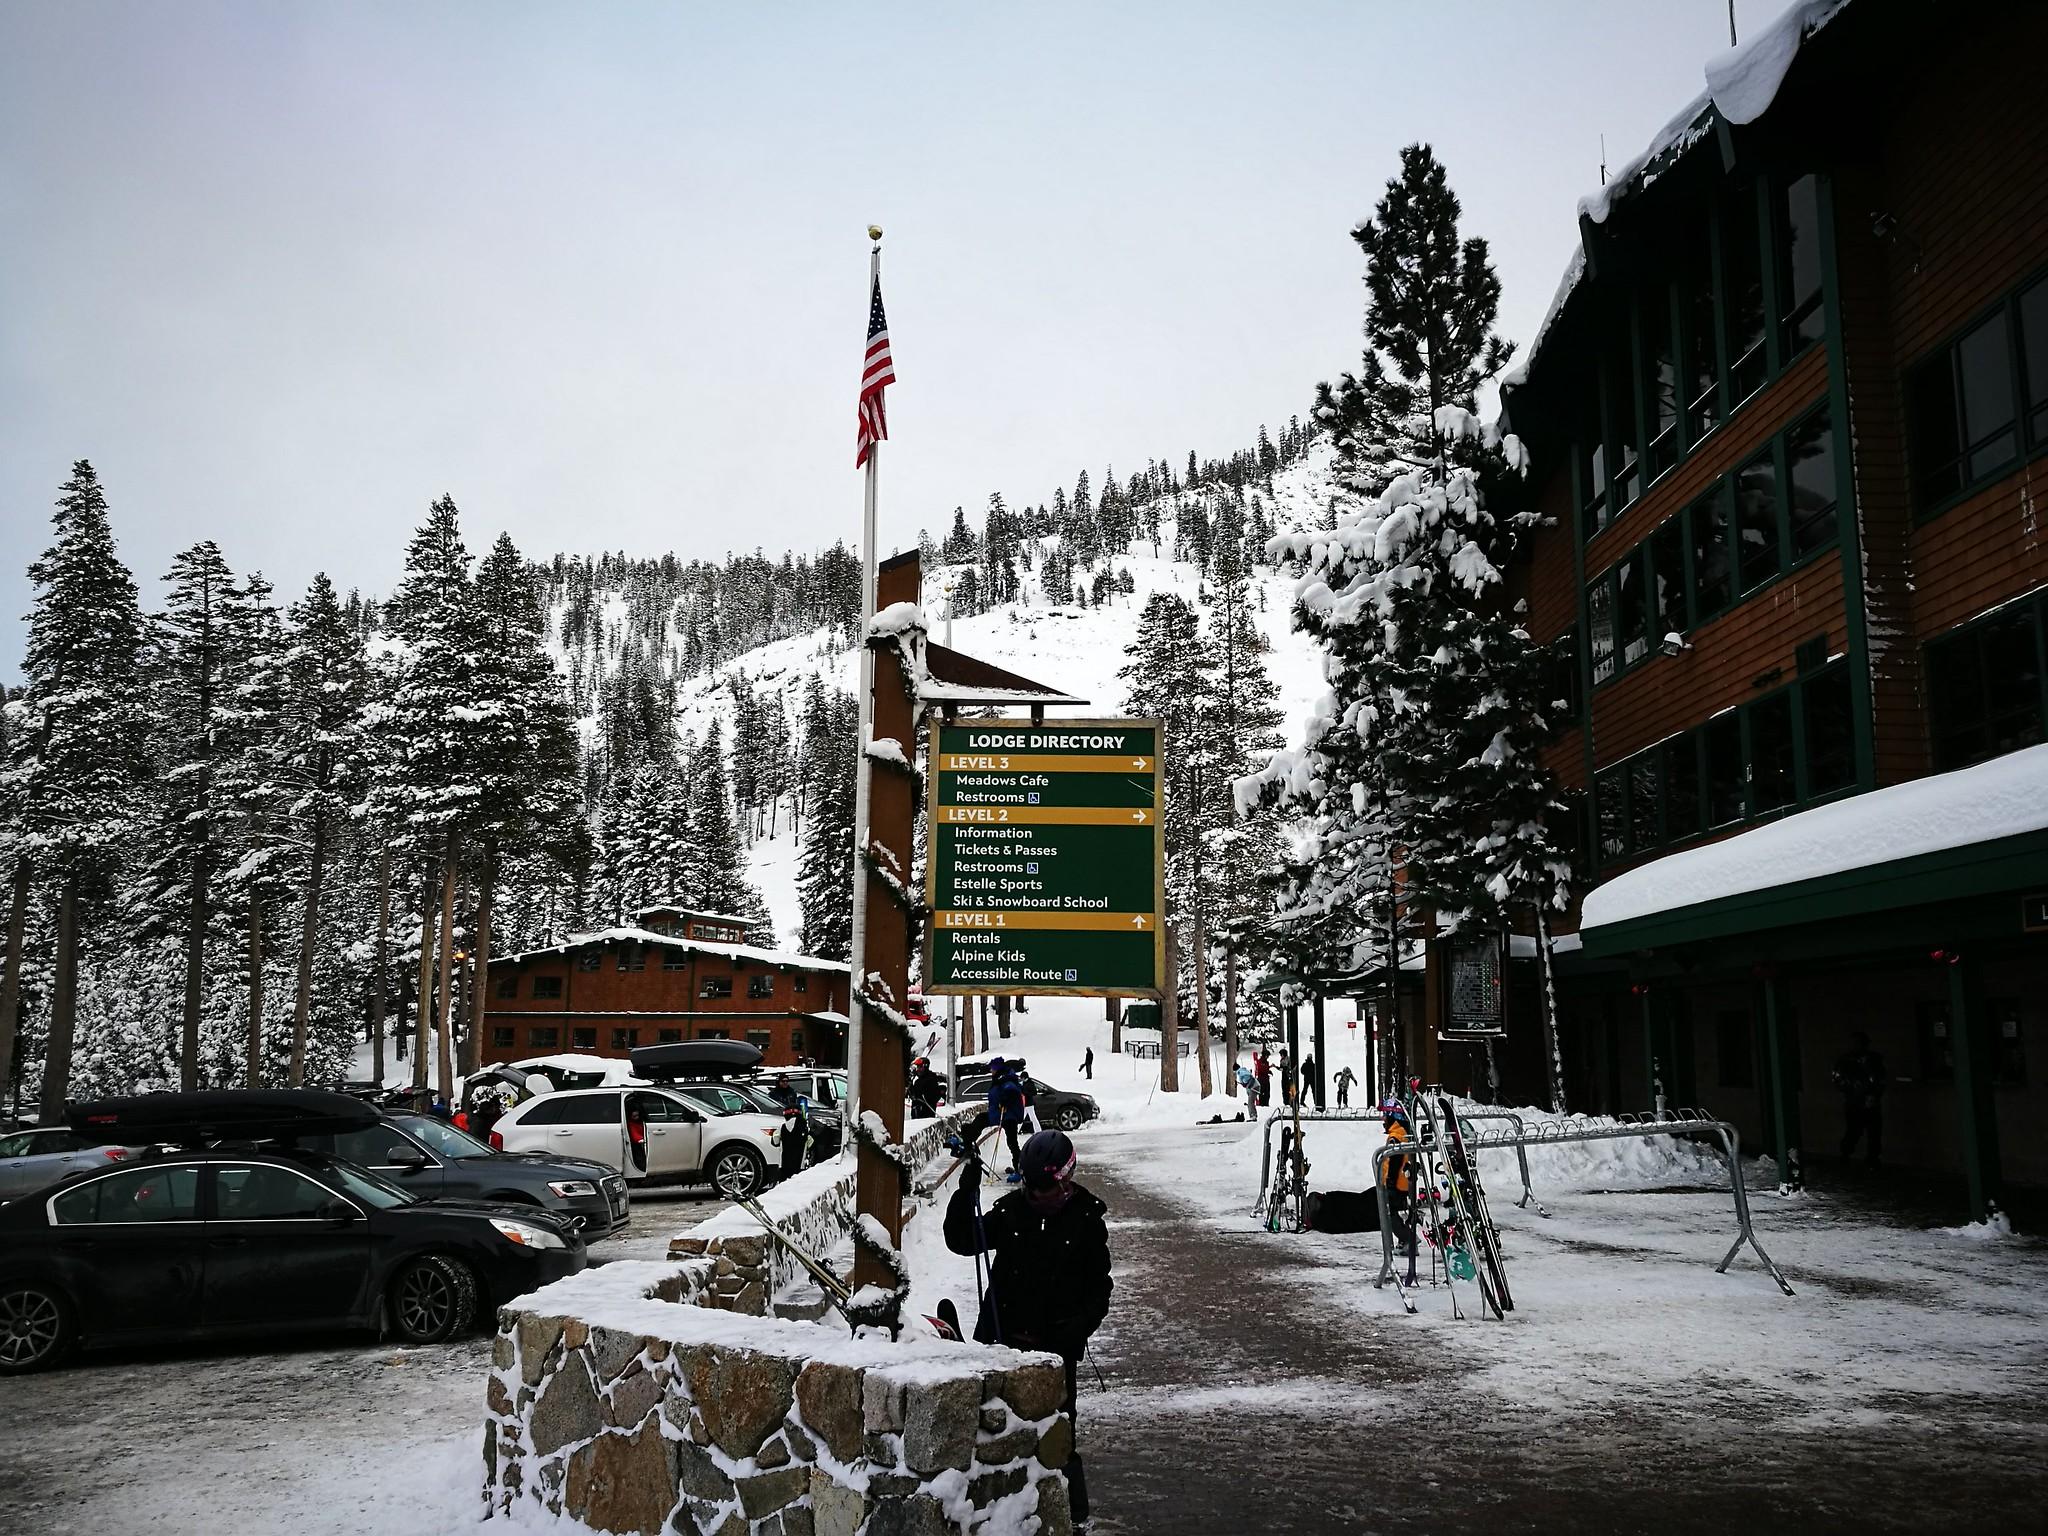 Lodge directory